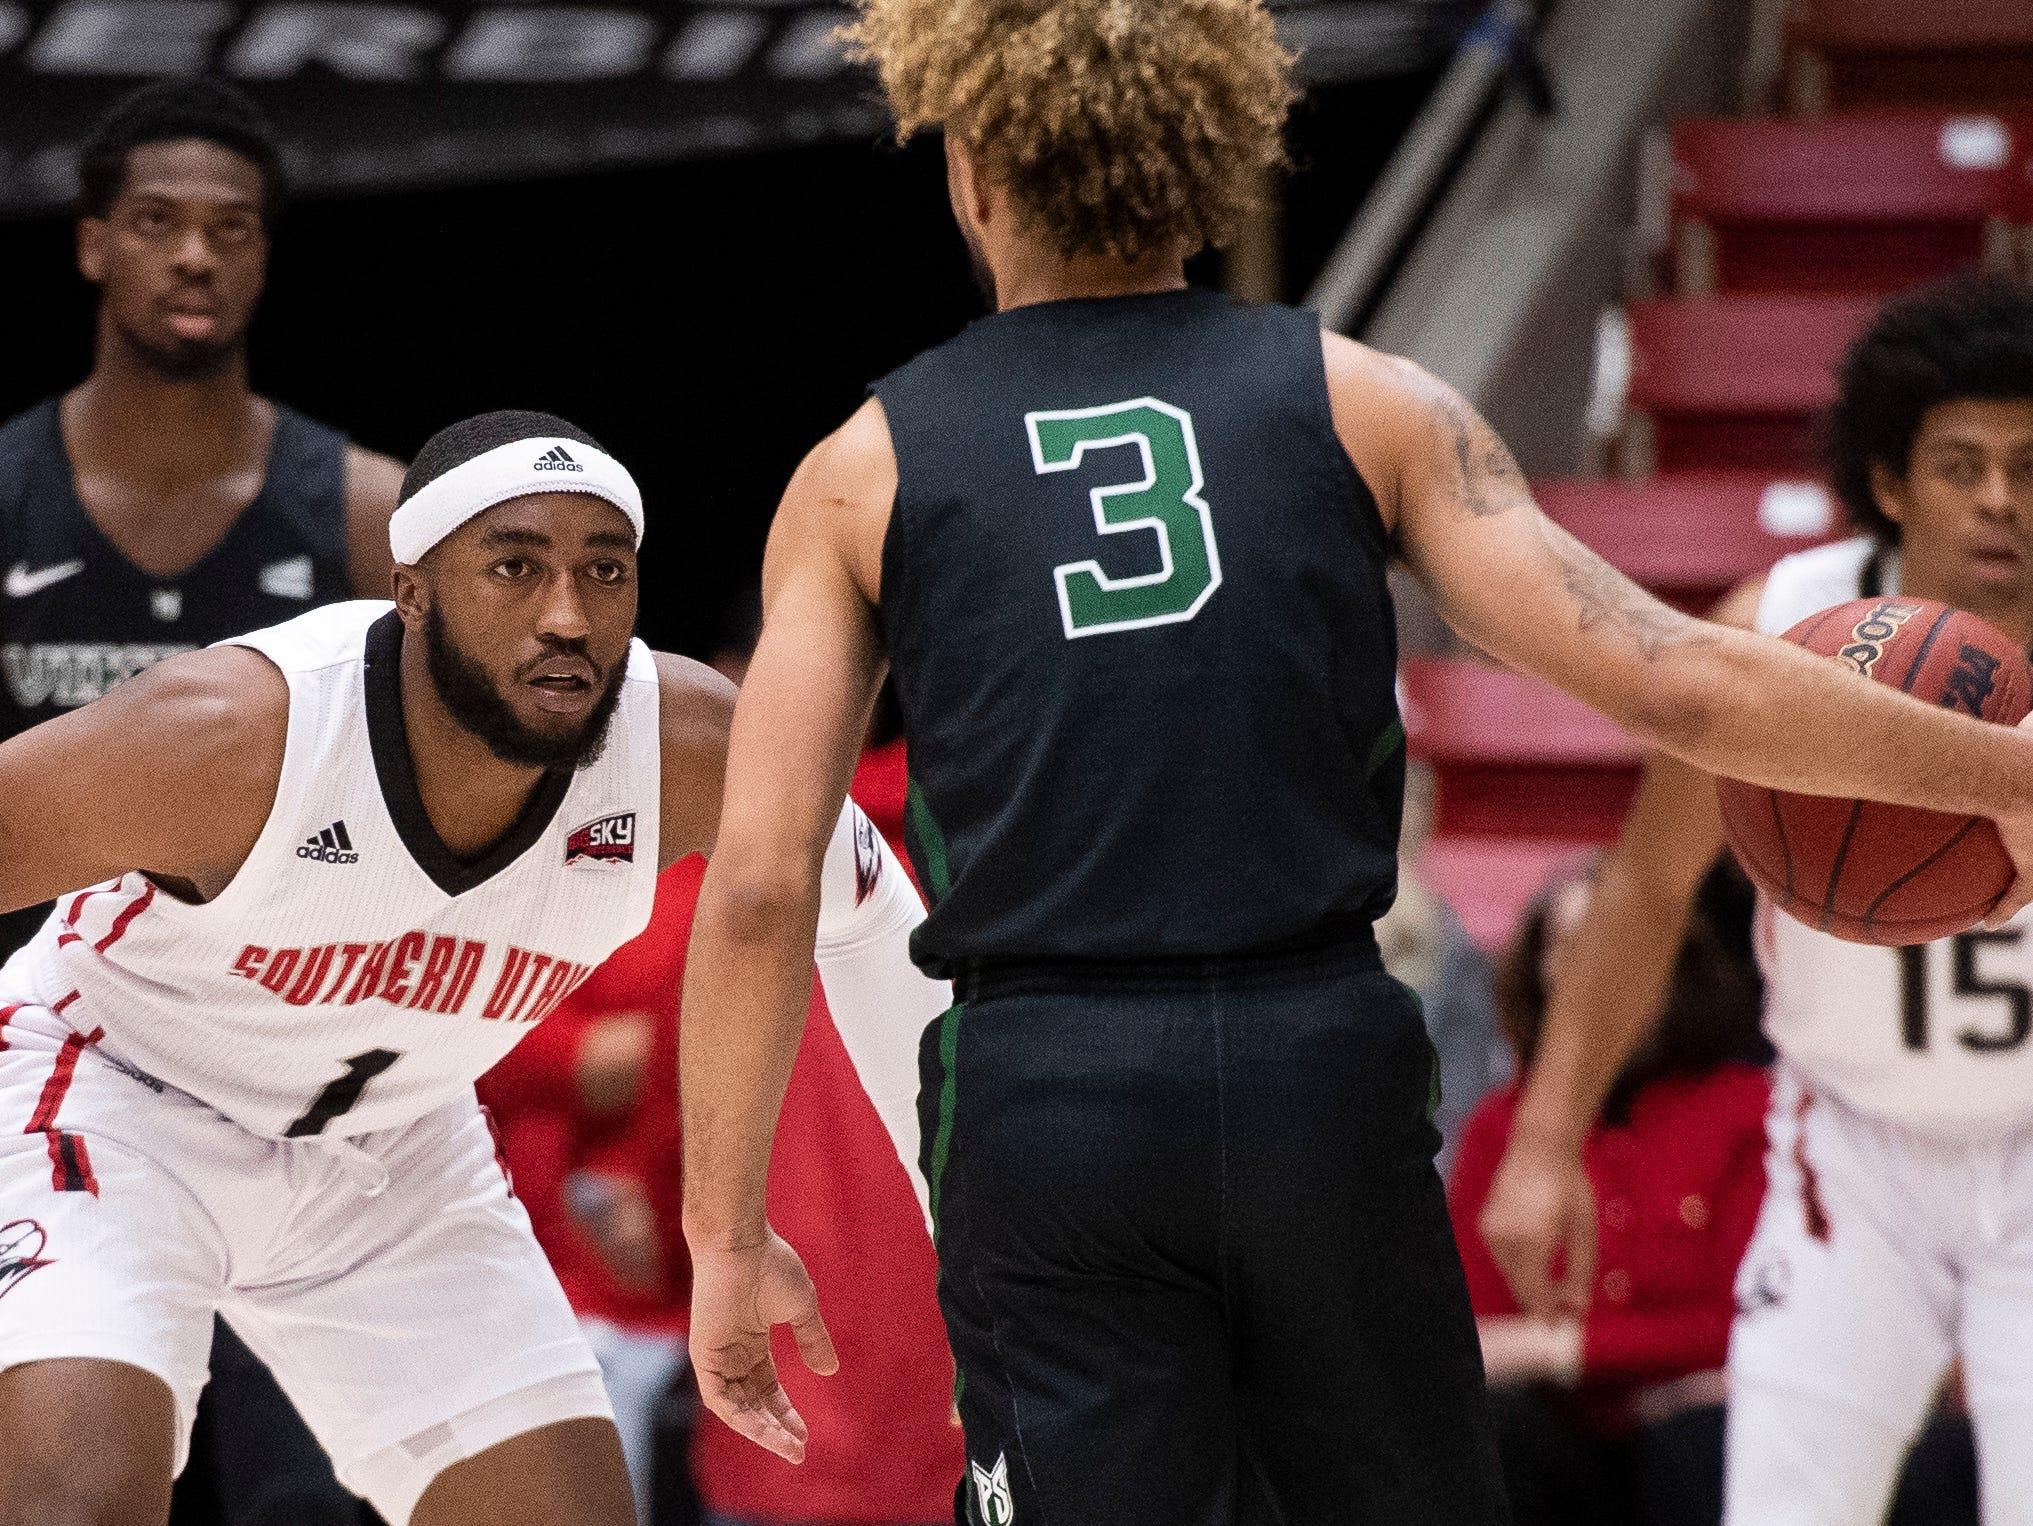 Southern Utah University freshman Kenton Eskridge (1) stares down his Portland State assignment in the America First Event Center Thursday, January 17, 2019. SUU won, 83-69.